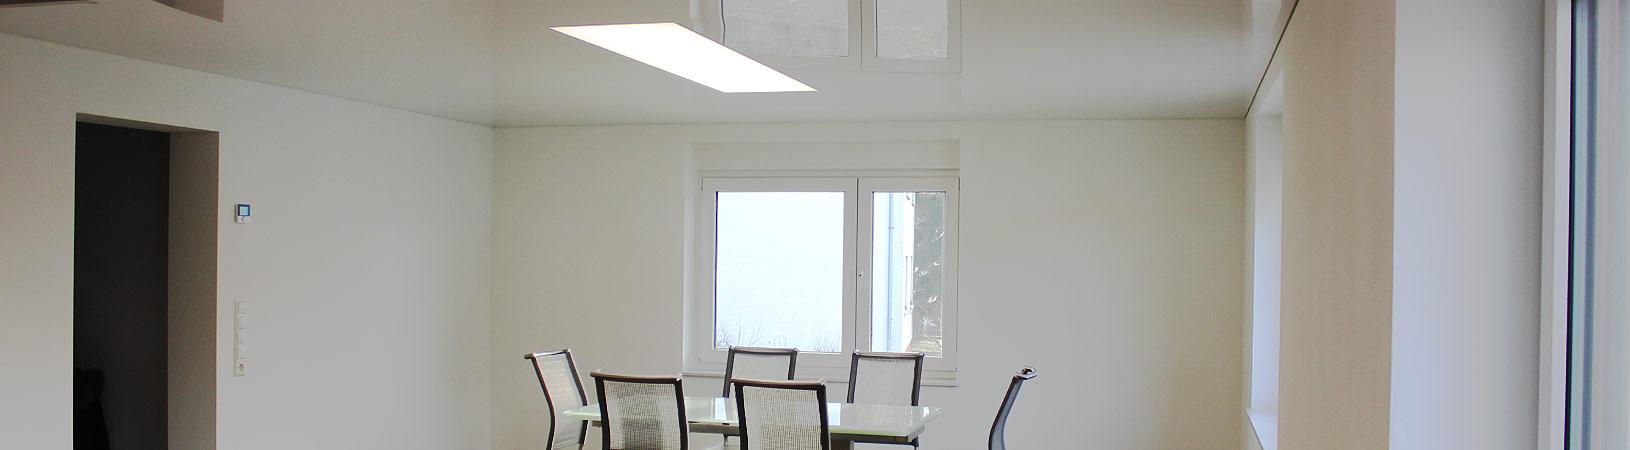 Decke-Maler-Hauser